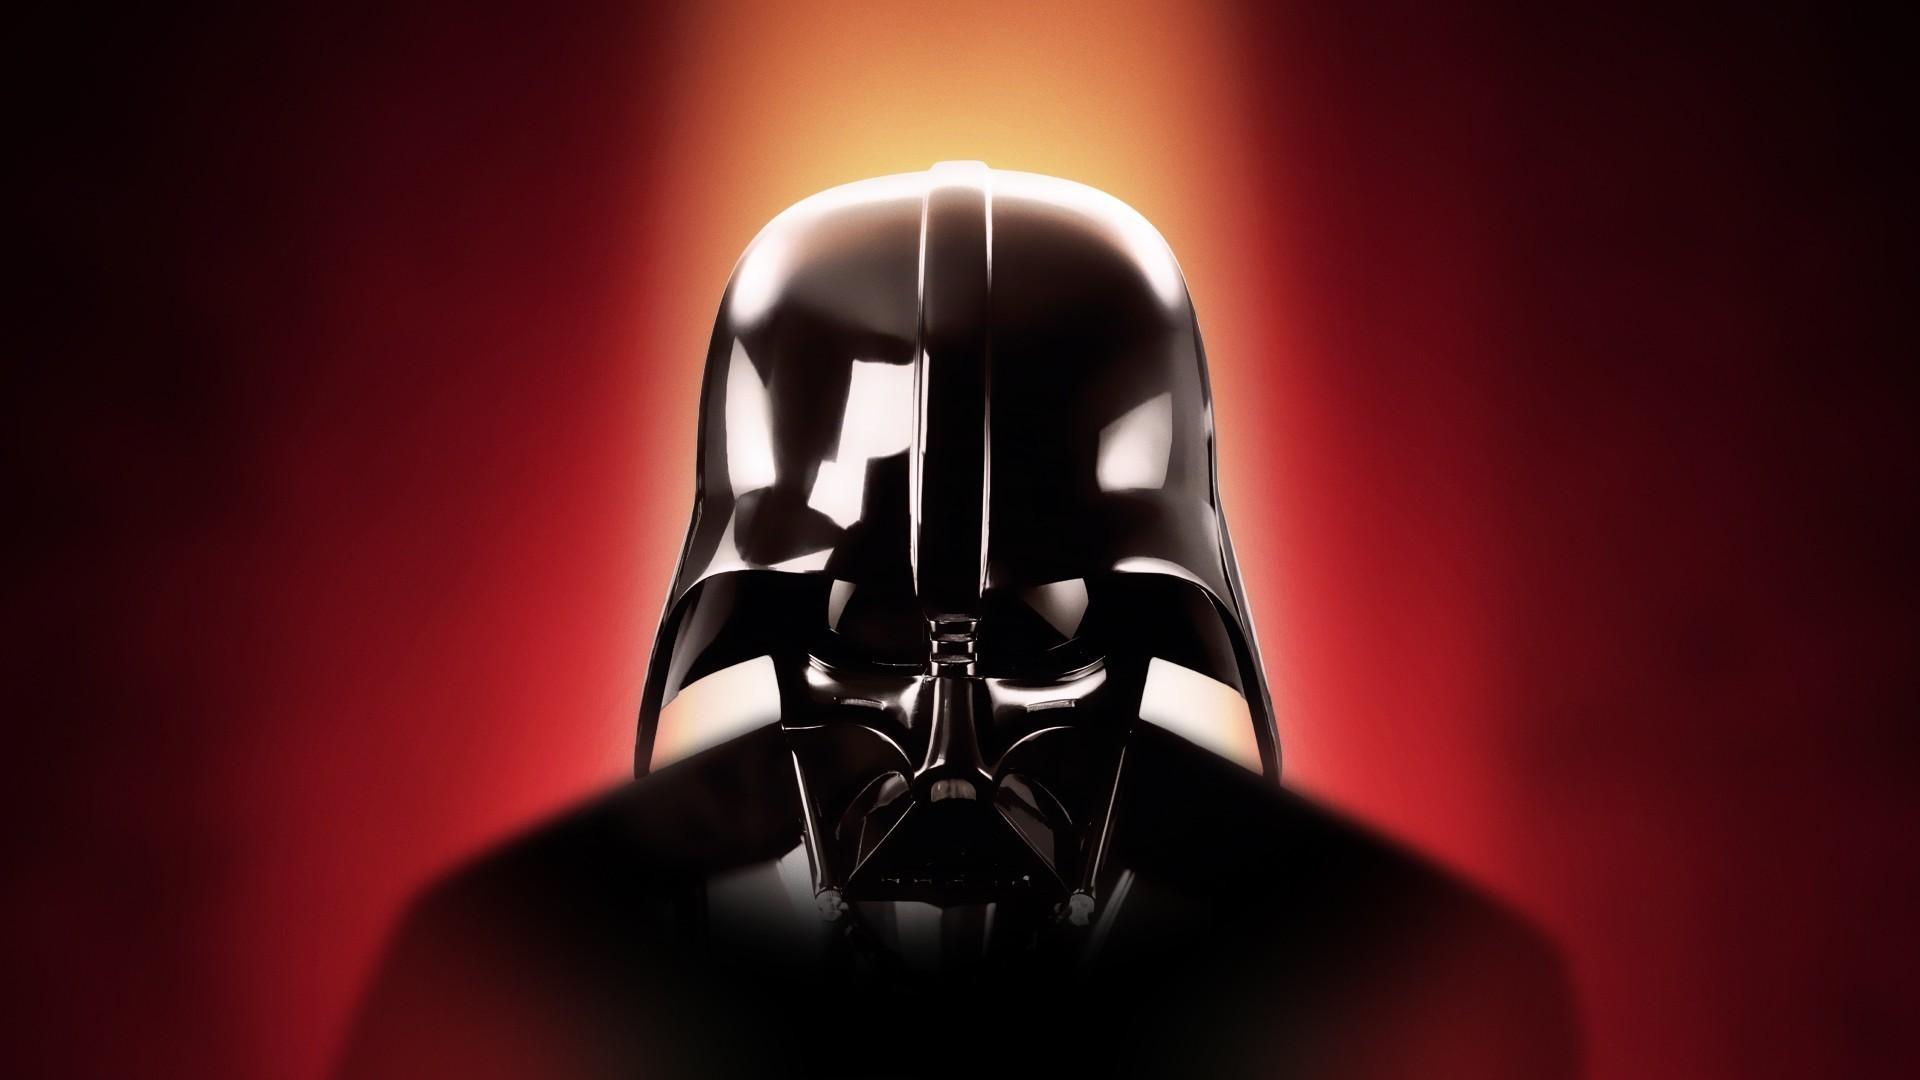 Movies, Star Wars, Darth Vader - Star Wars , HD Wallpaper & Backgrounds